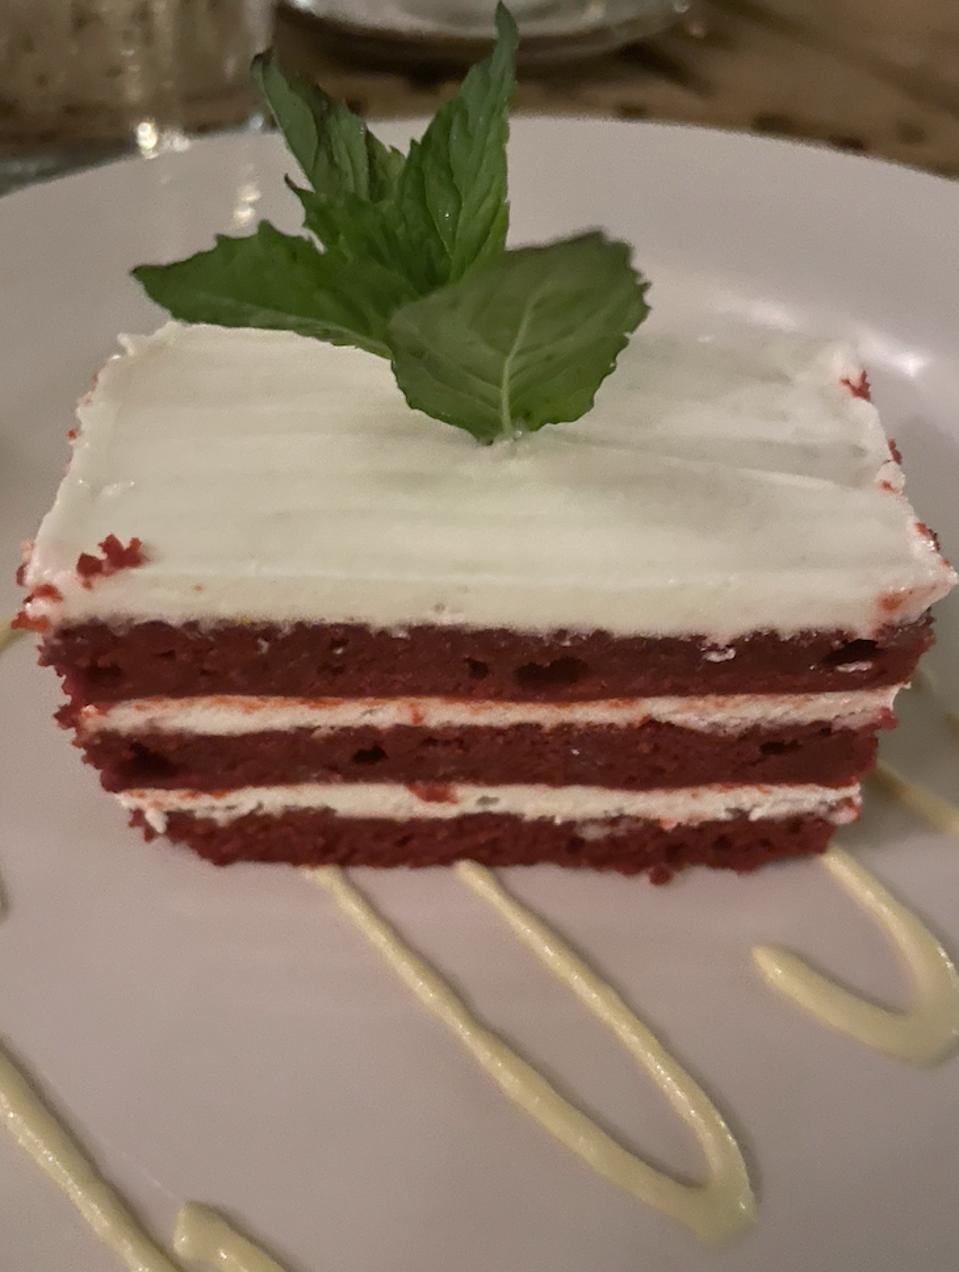 Red velvet cake at The Loren at Pink Beach